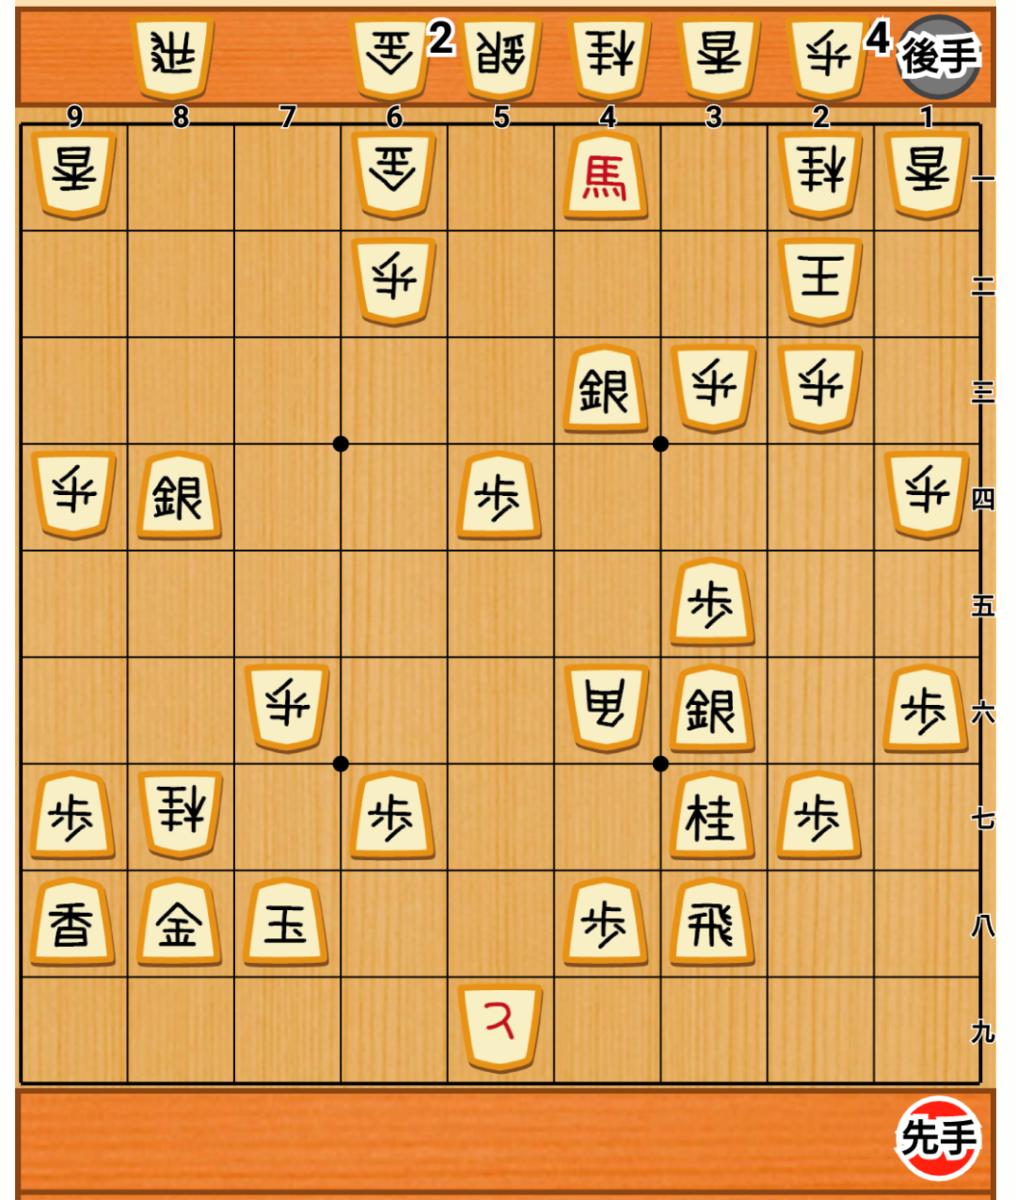 f:id:nao-shodan:20200530174758p:plain